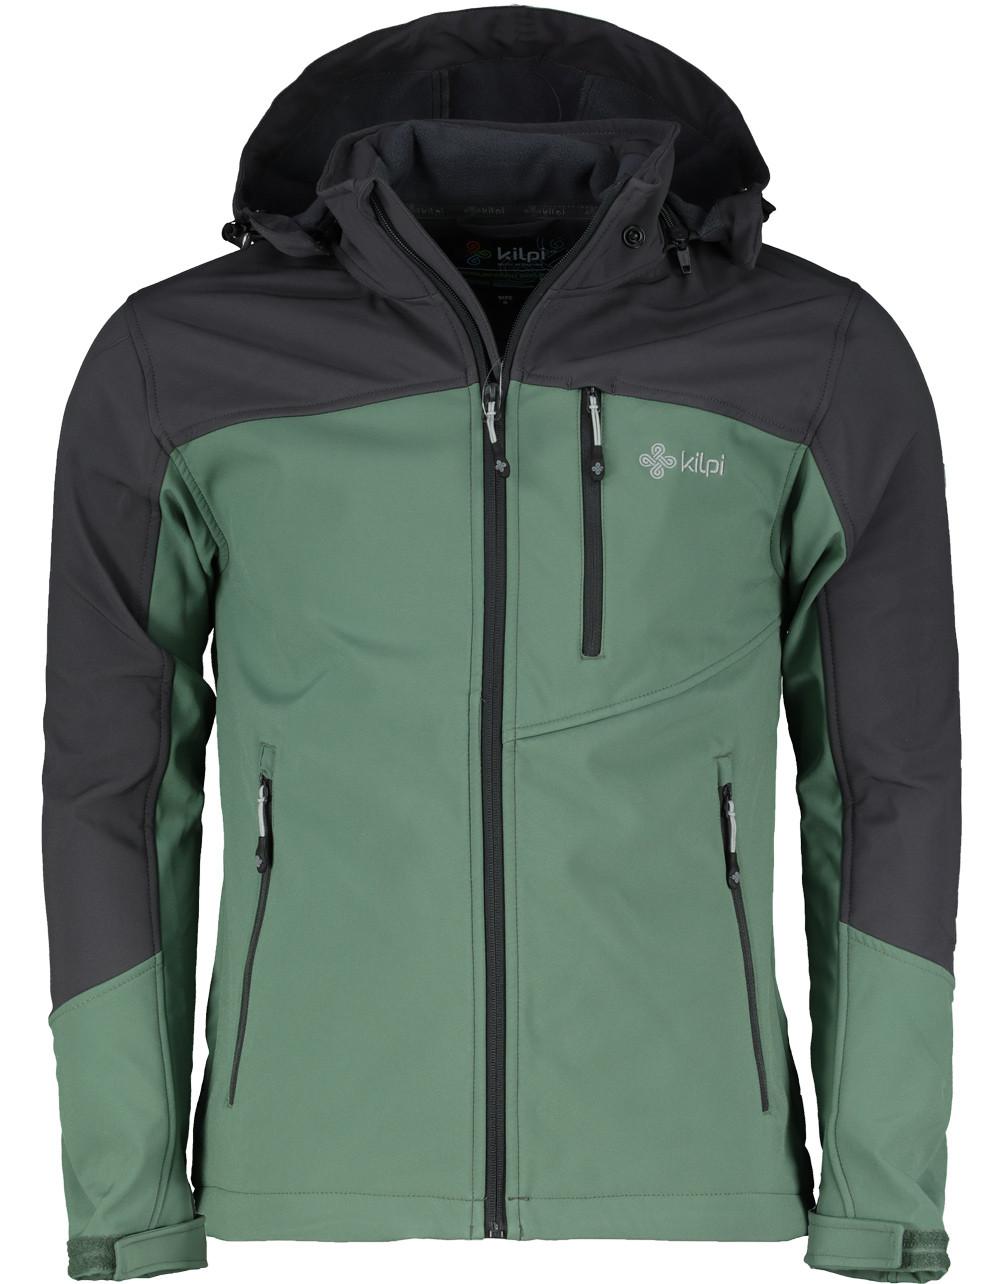 Men's jacket Kilpi Elio